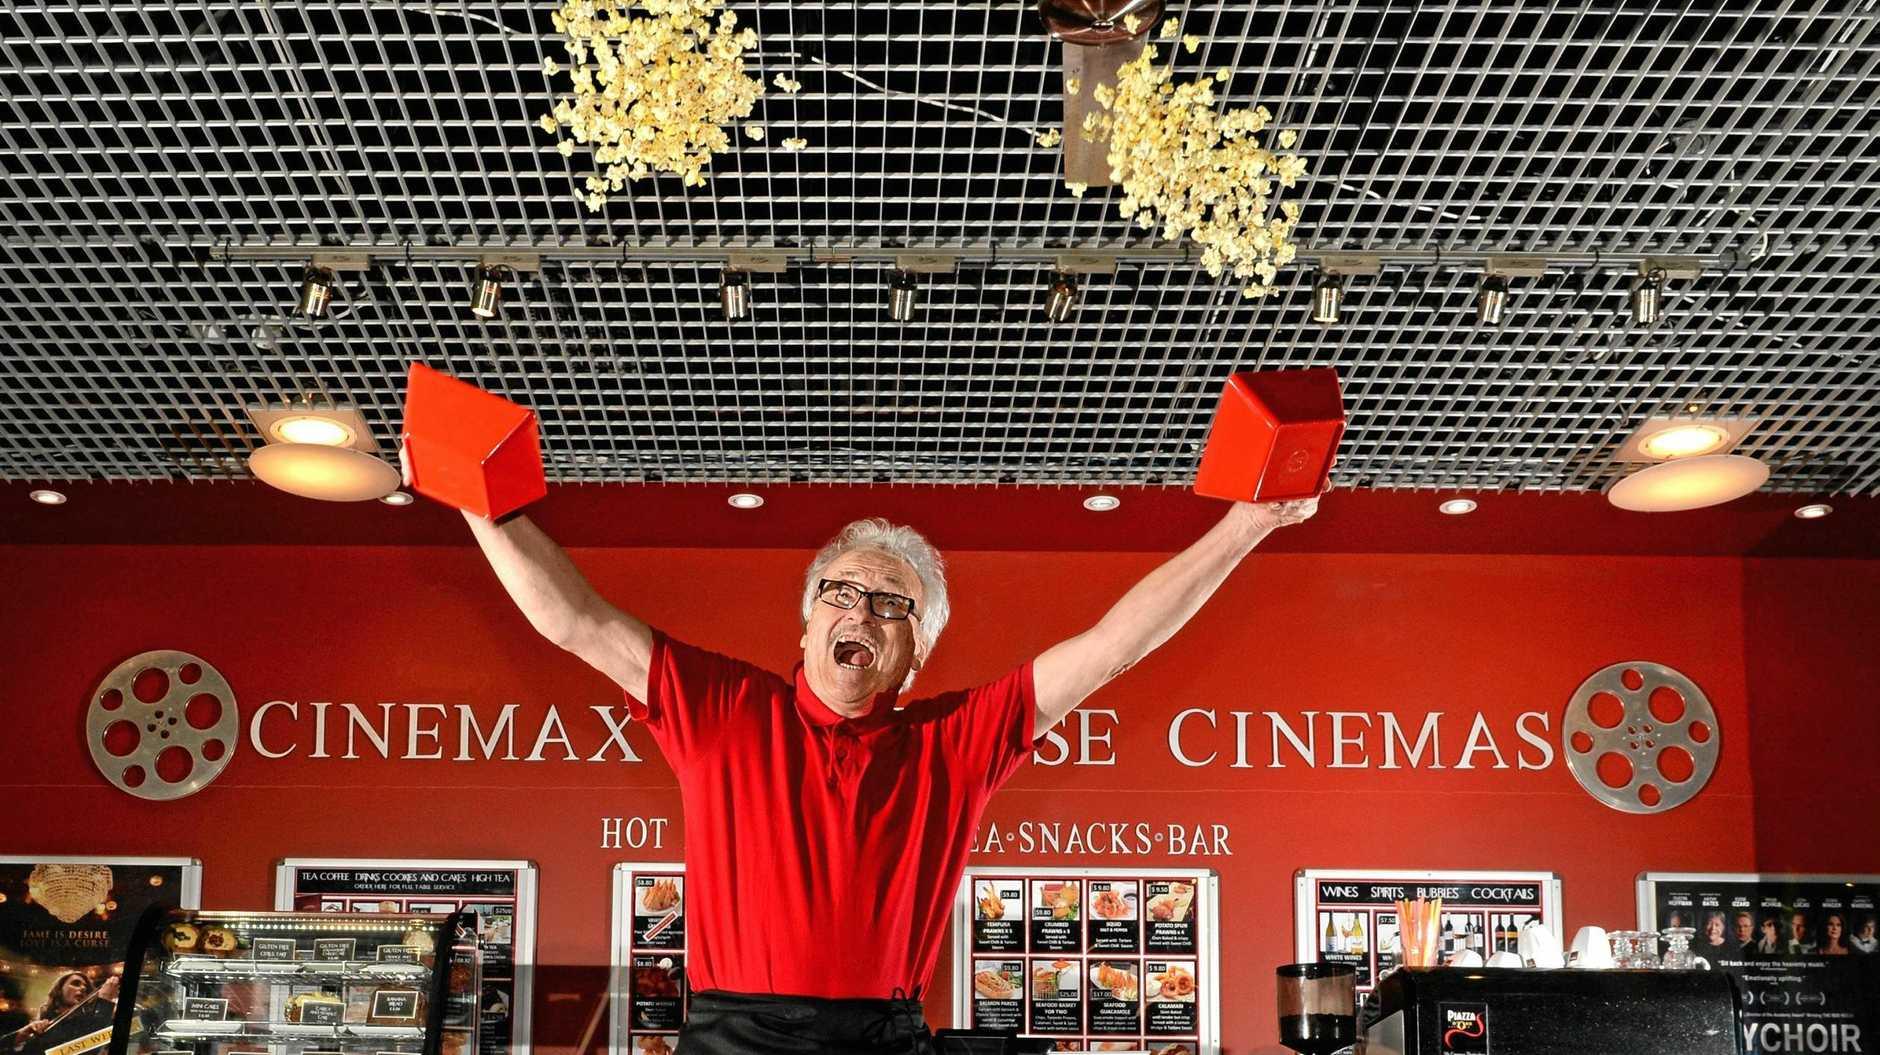 Kingscliff Cinema owner Stephen Buge.